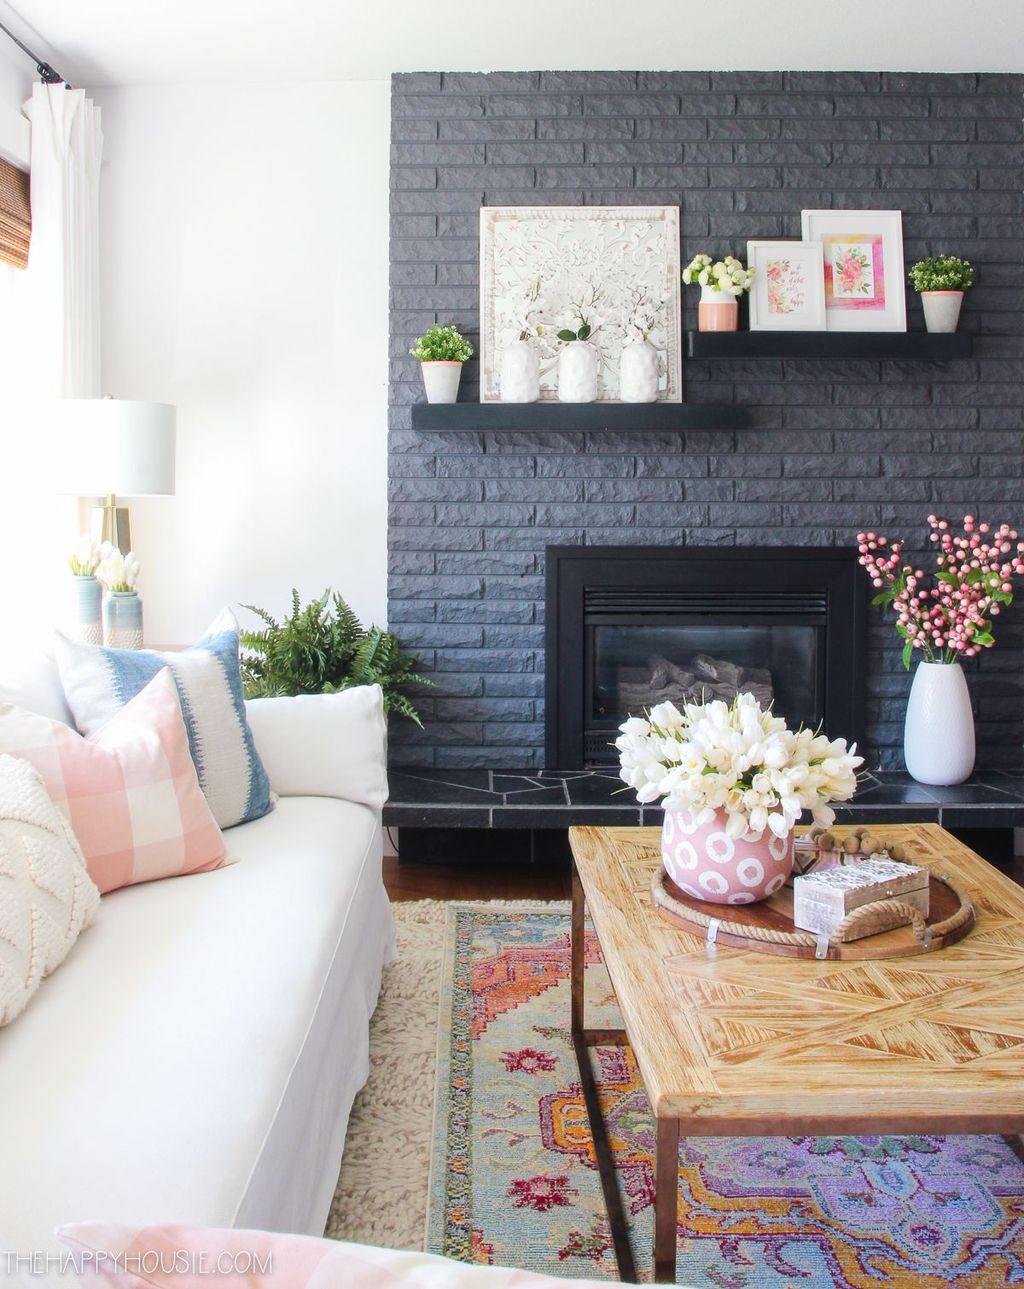 Beautiful Spring Home Decor Ideas You Should Copy 25